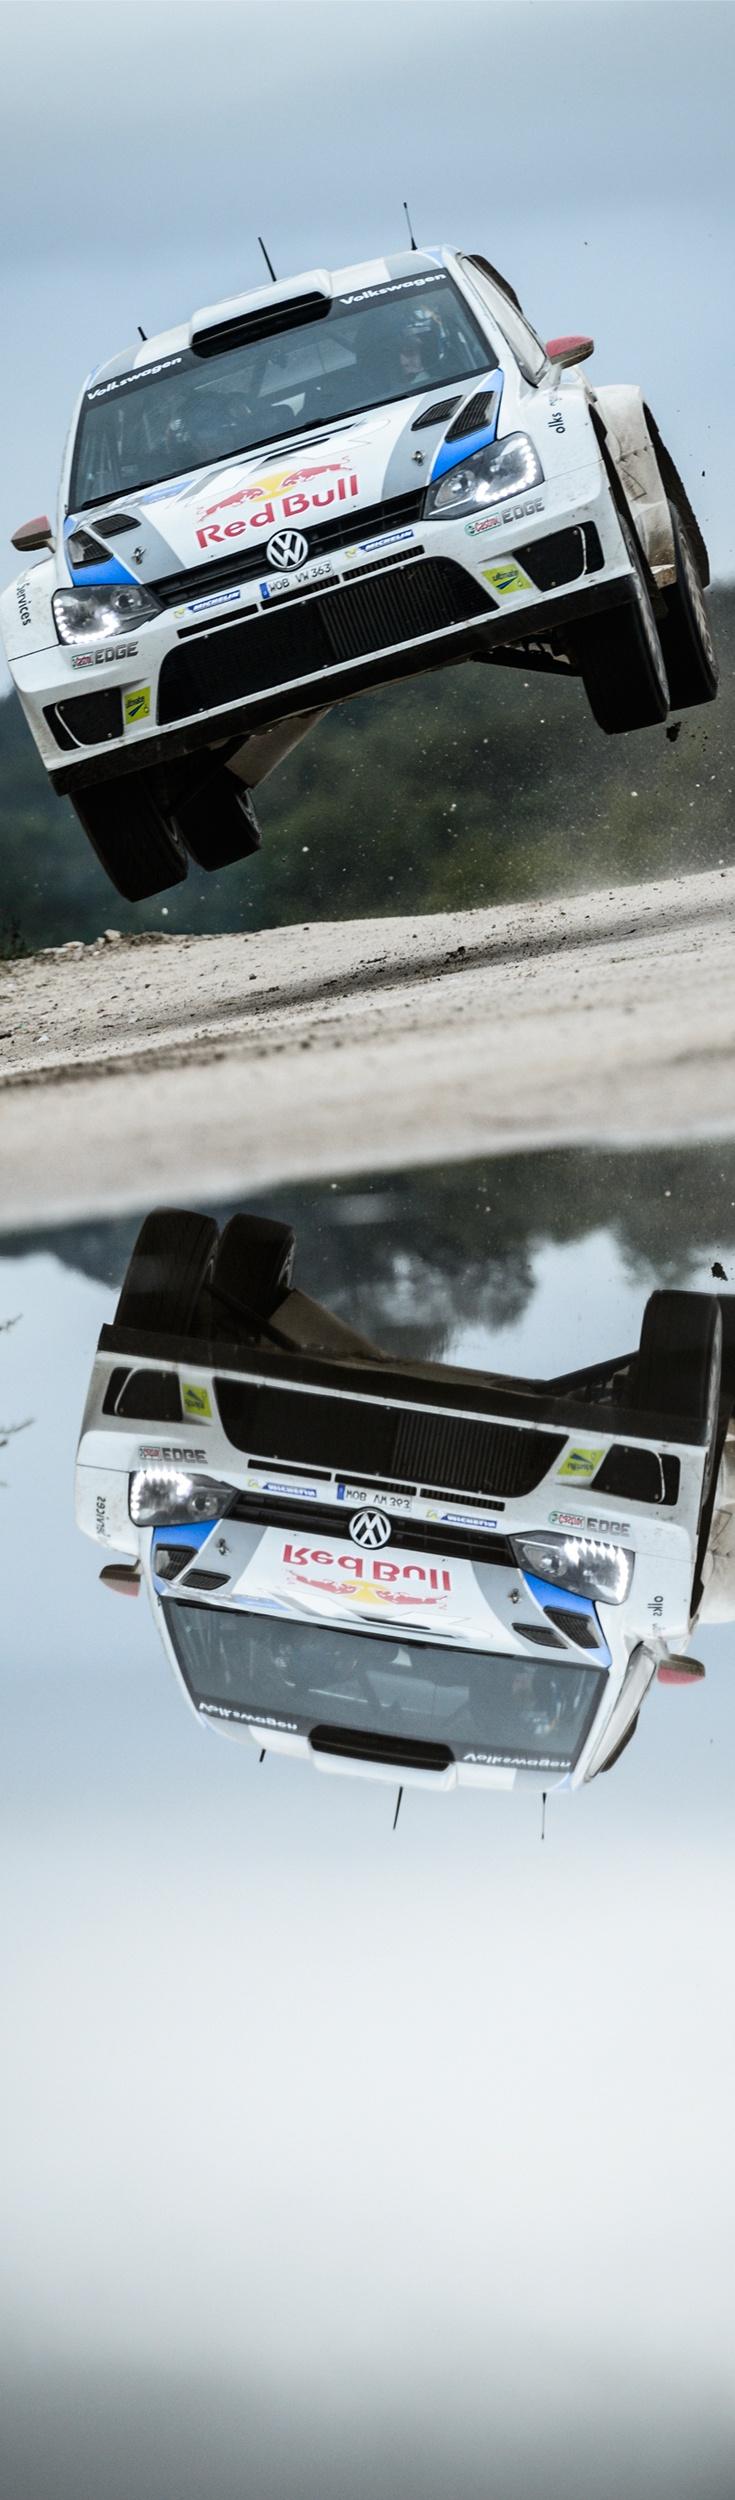 Carmania Facebook Rally Car Vw Motorsport Rally Racing